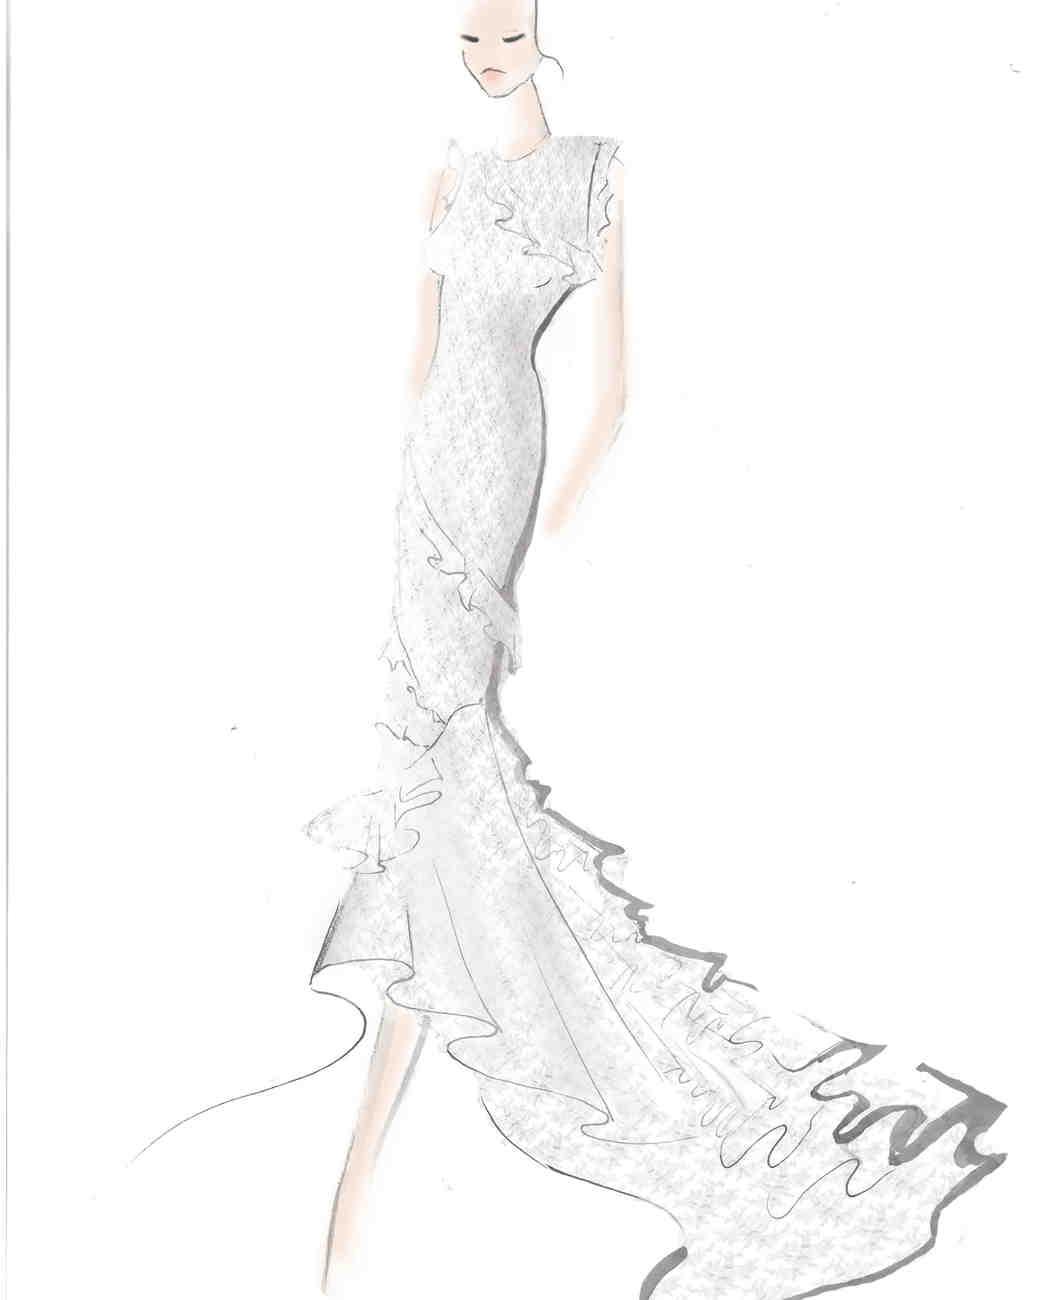 sachin-and-babi-fall-2017-exclusive-wedding-dress-sketch-0916.jpg